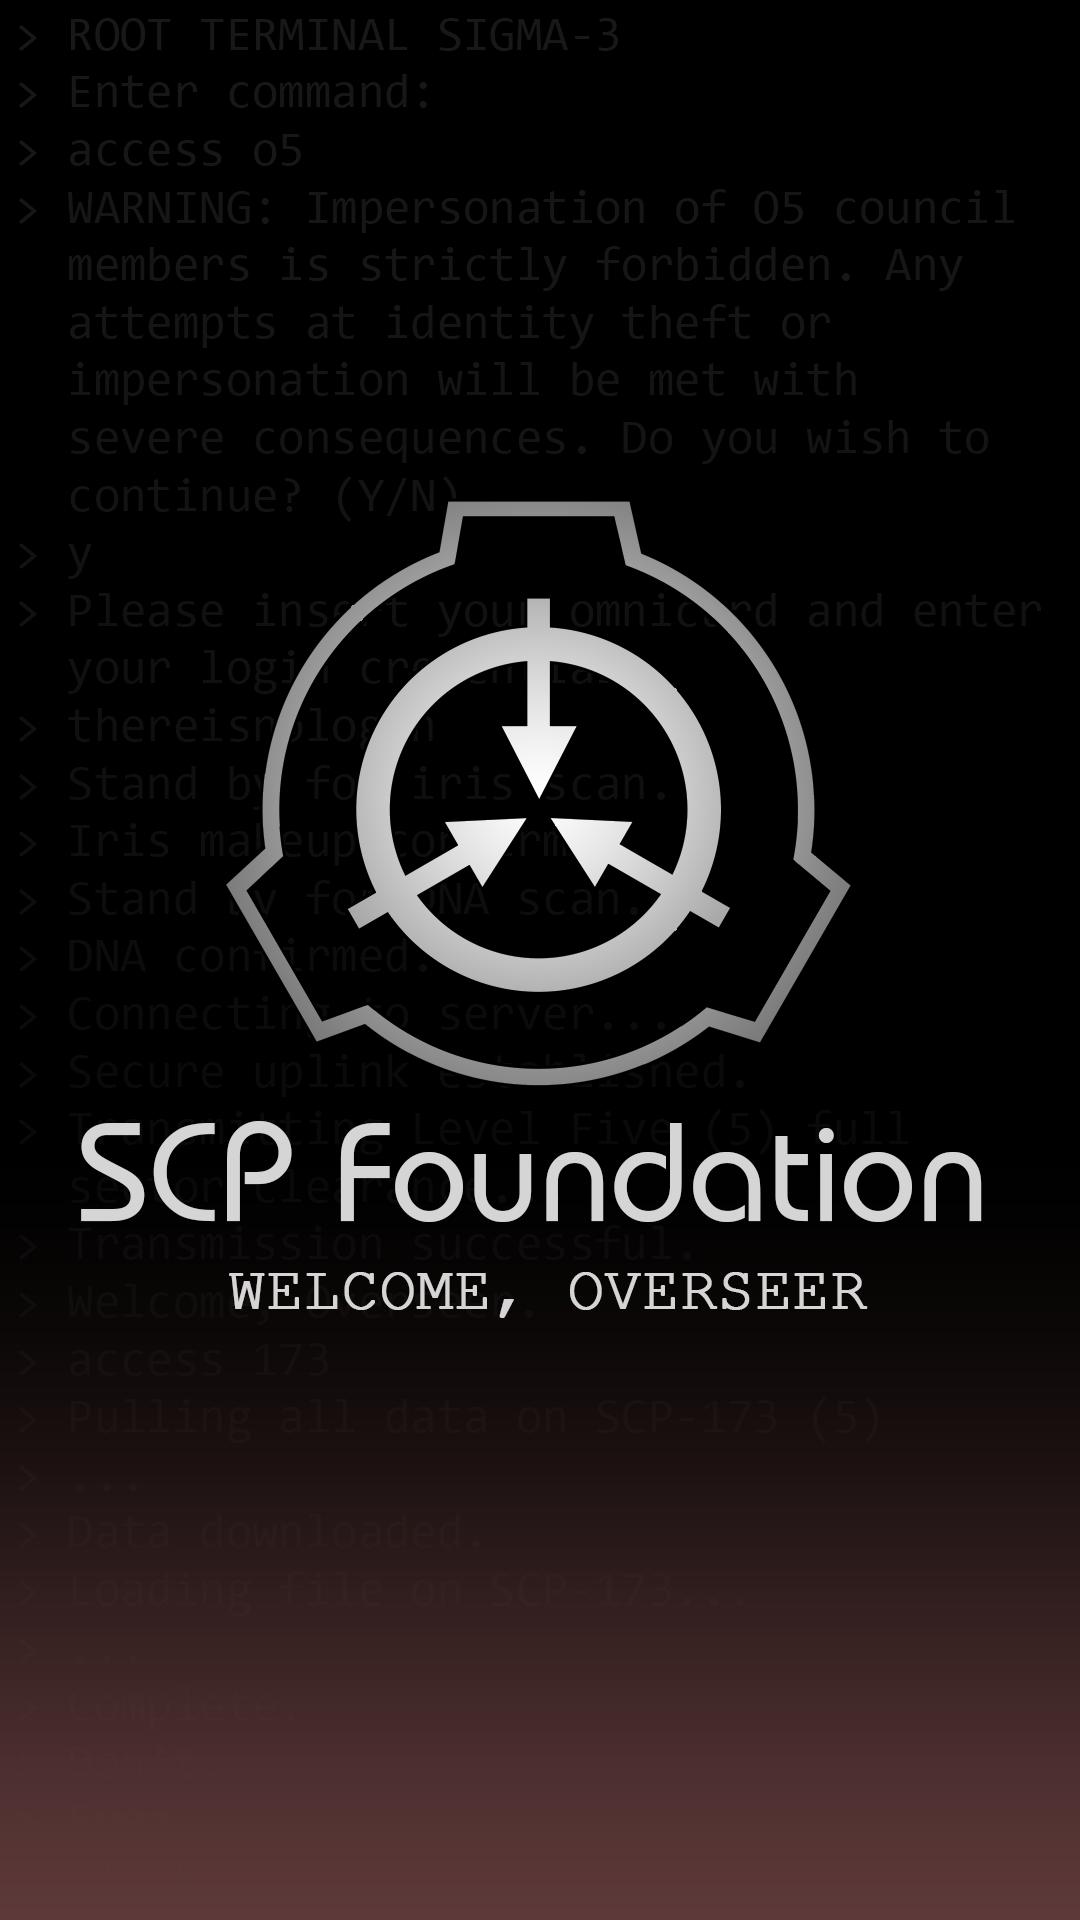 Scp Foundation Background 1080x1920 Download Hd Wallpaper Wallpapertip